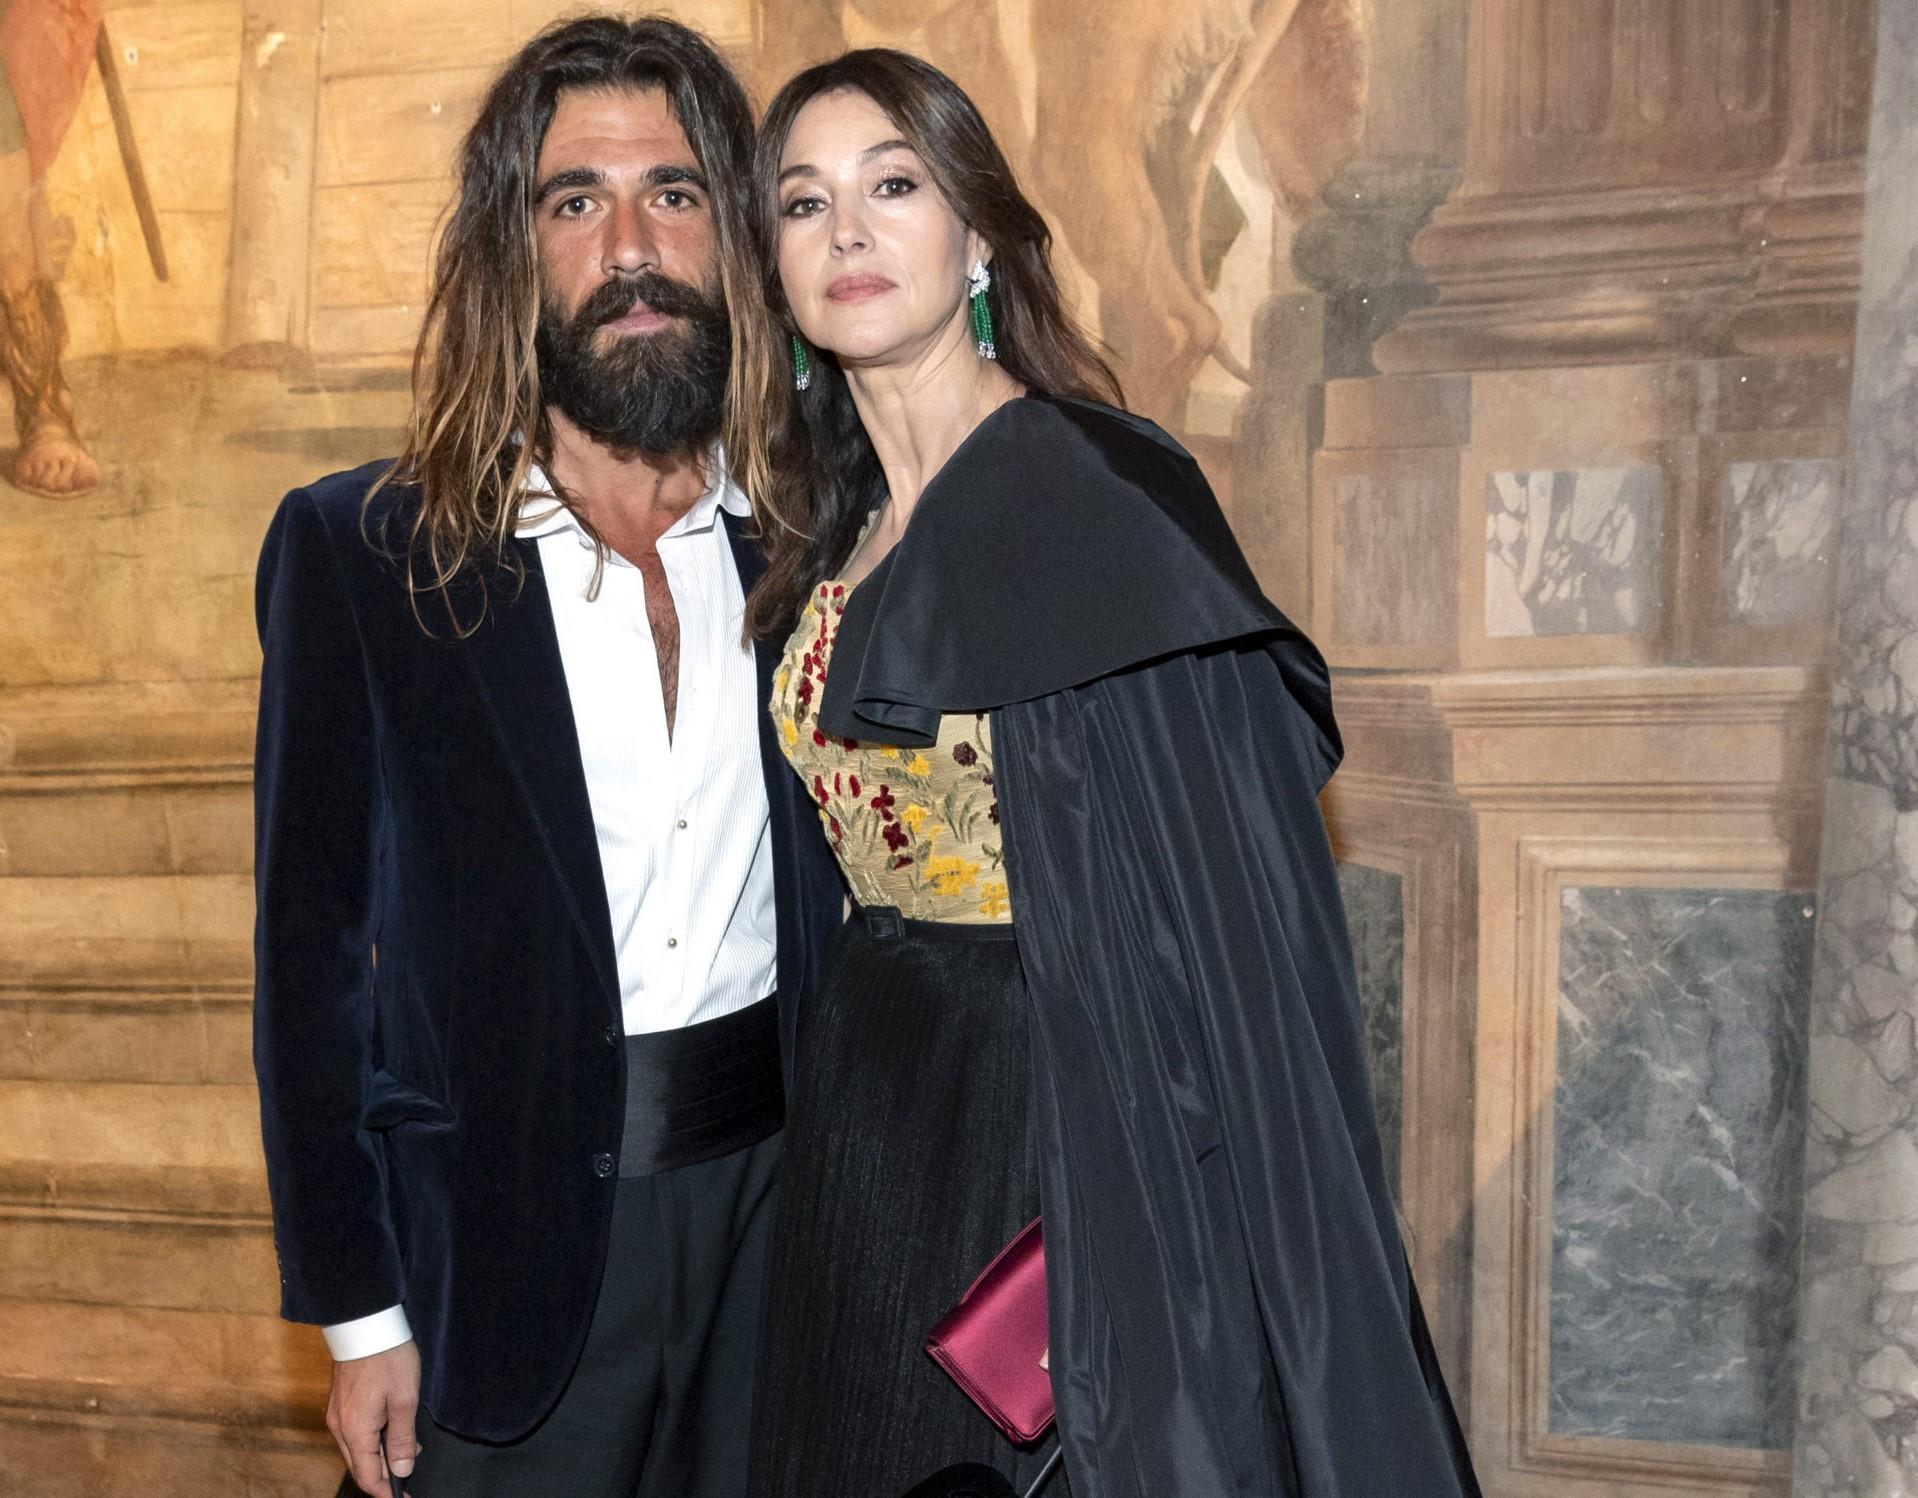 Знаменитости: Николас Лефевр и Моника Беллуччи